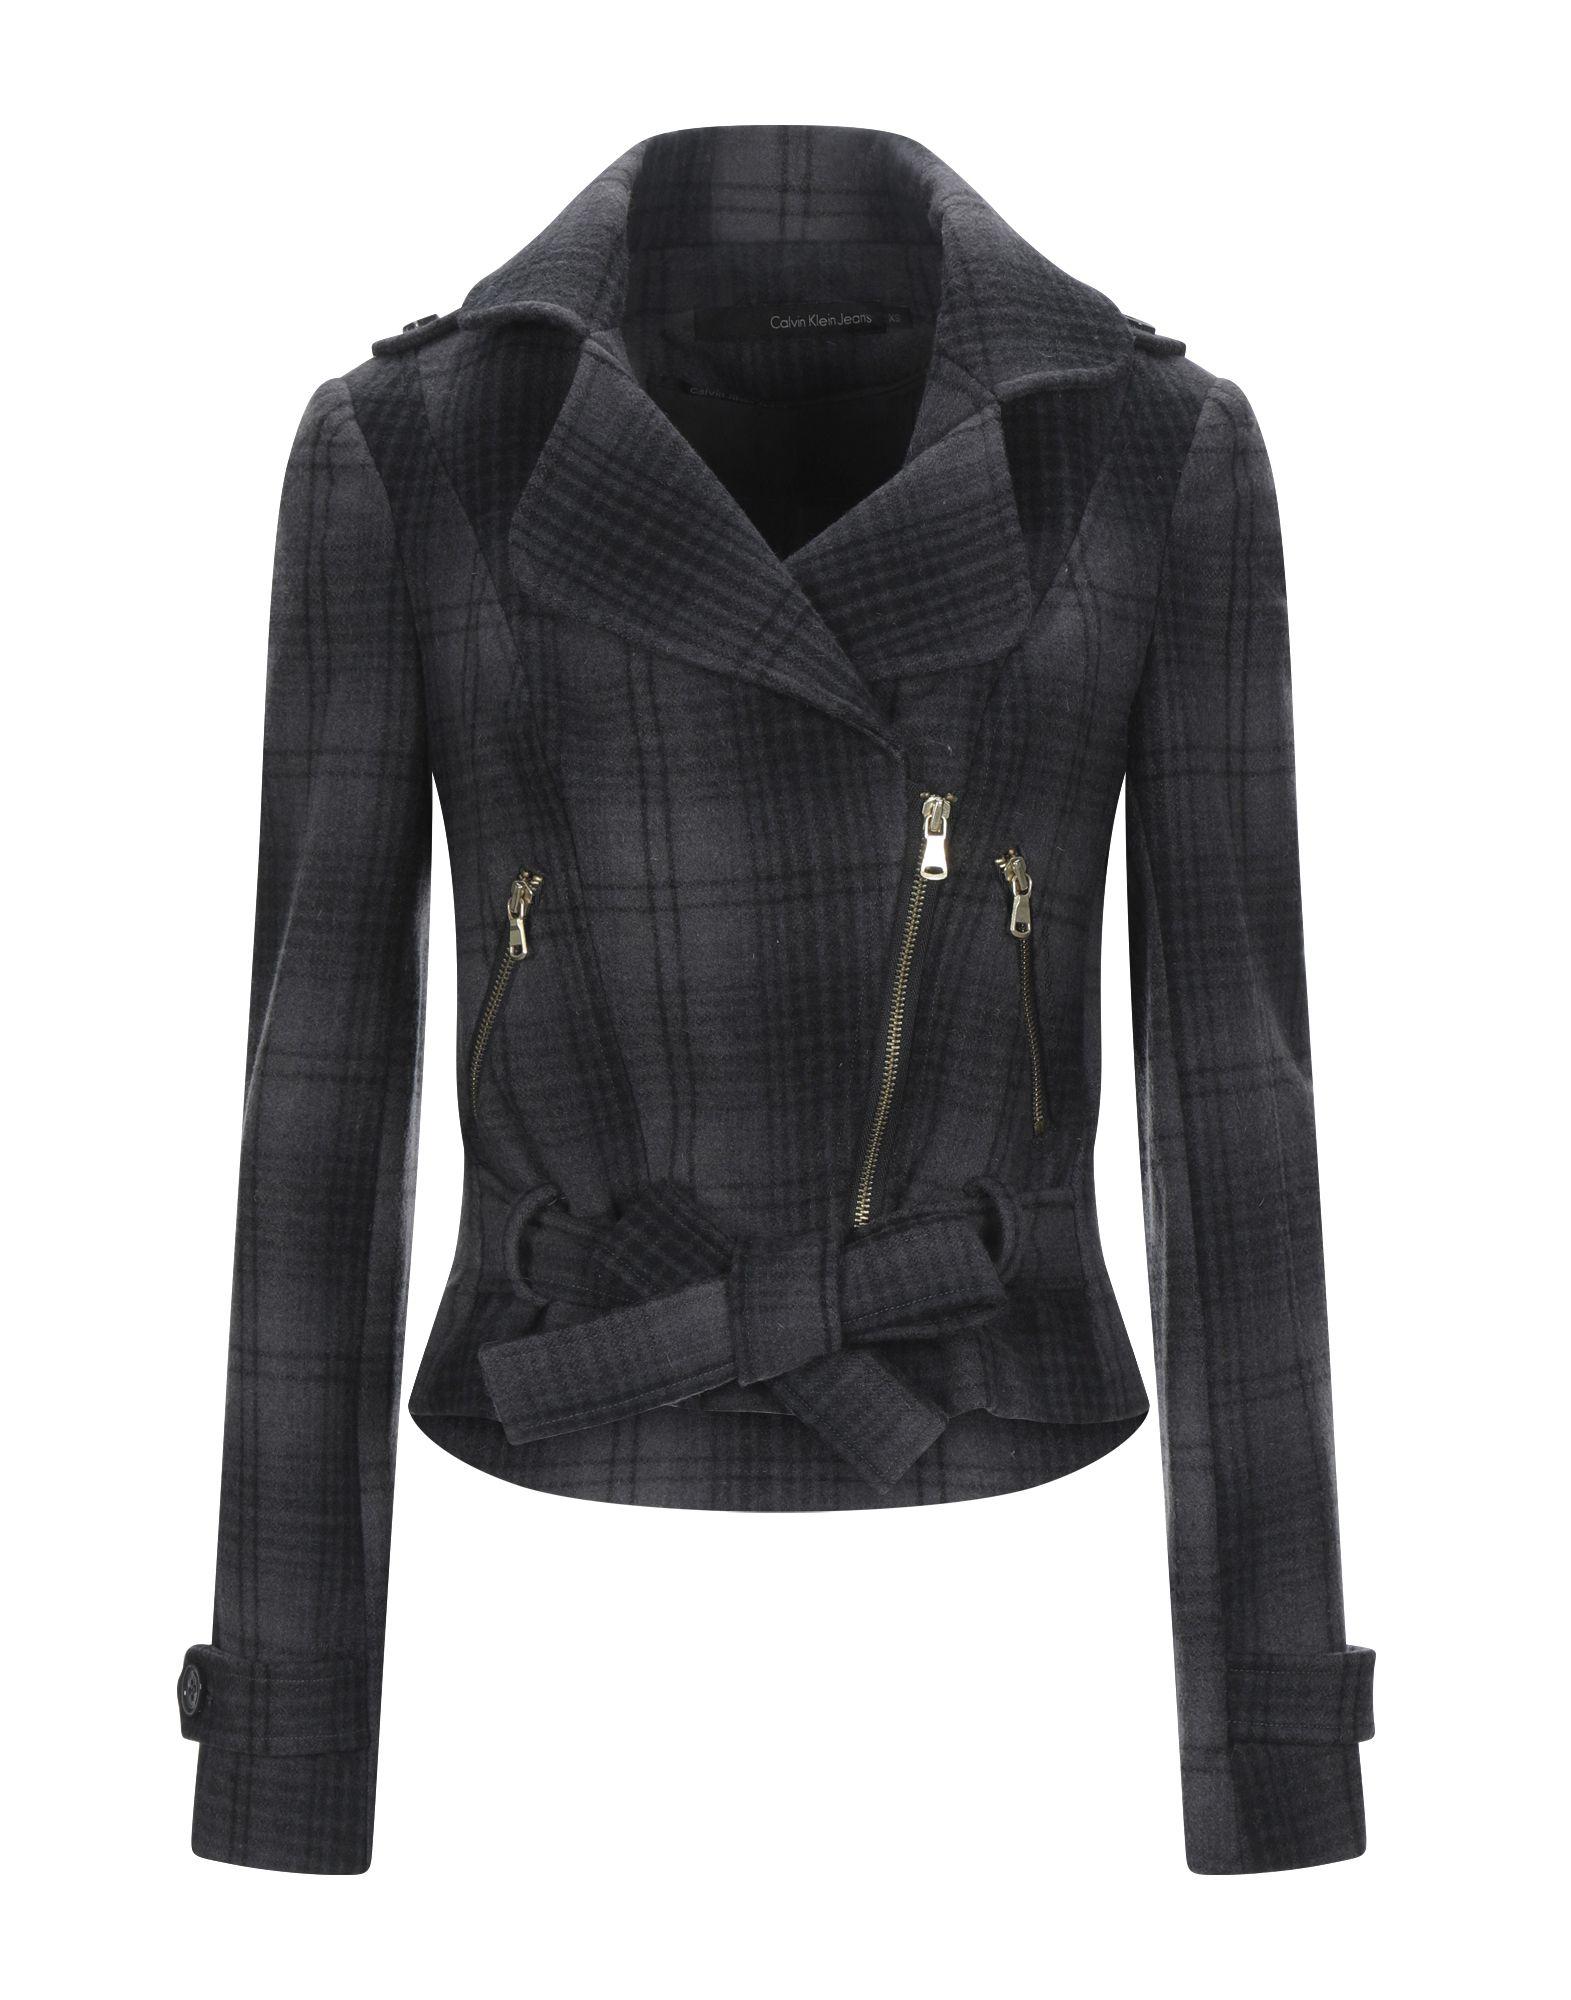 CALVIN KLEIN JEANS Куртка куртка мужская calvin klein jeans цвет темно синий j30j300668 размер s 44 46